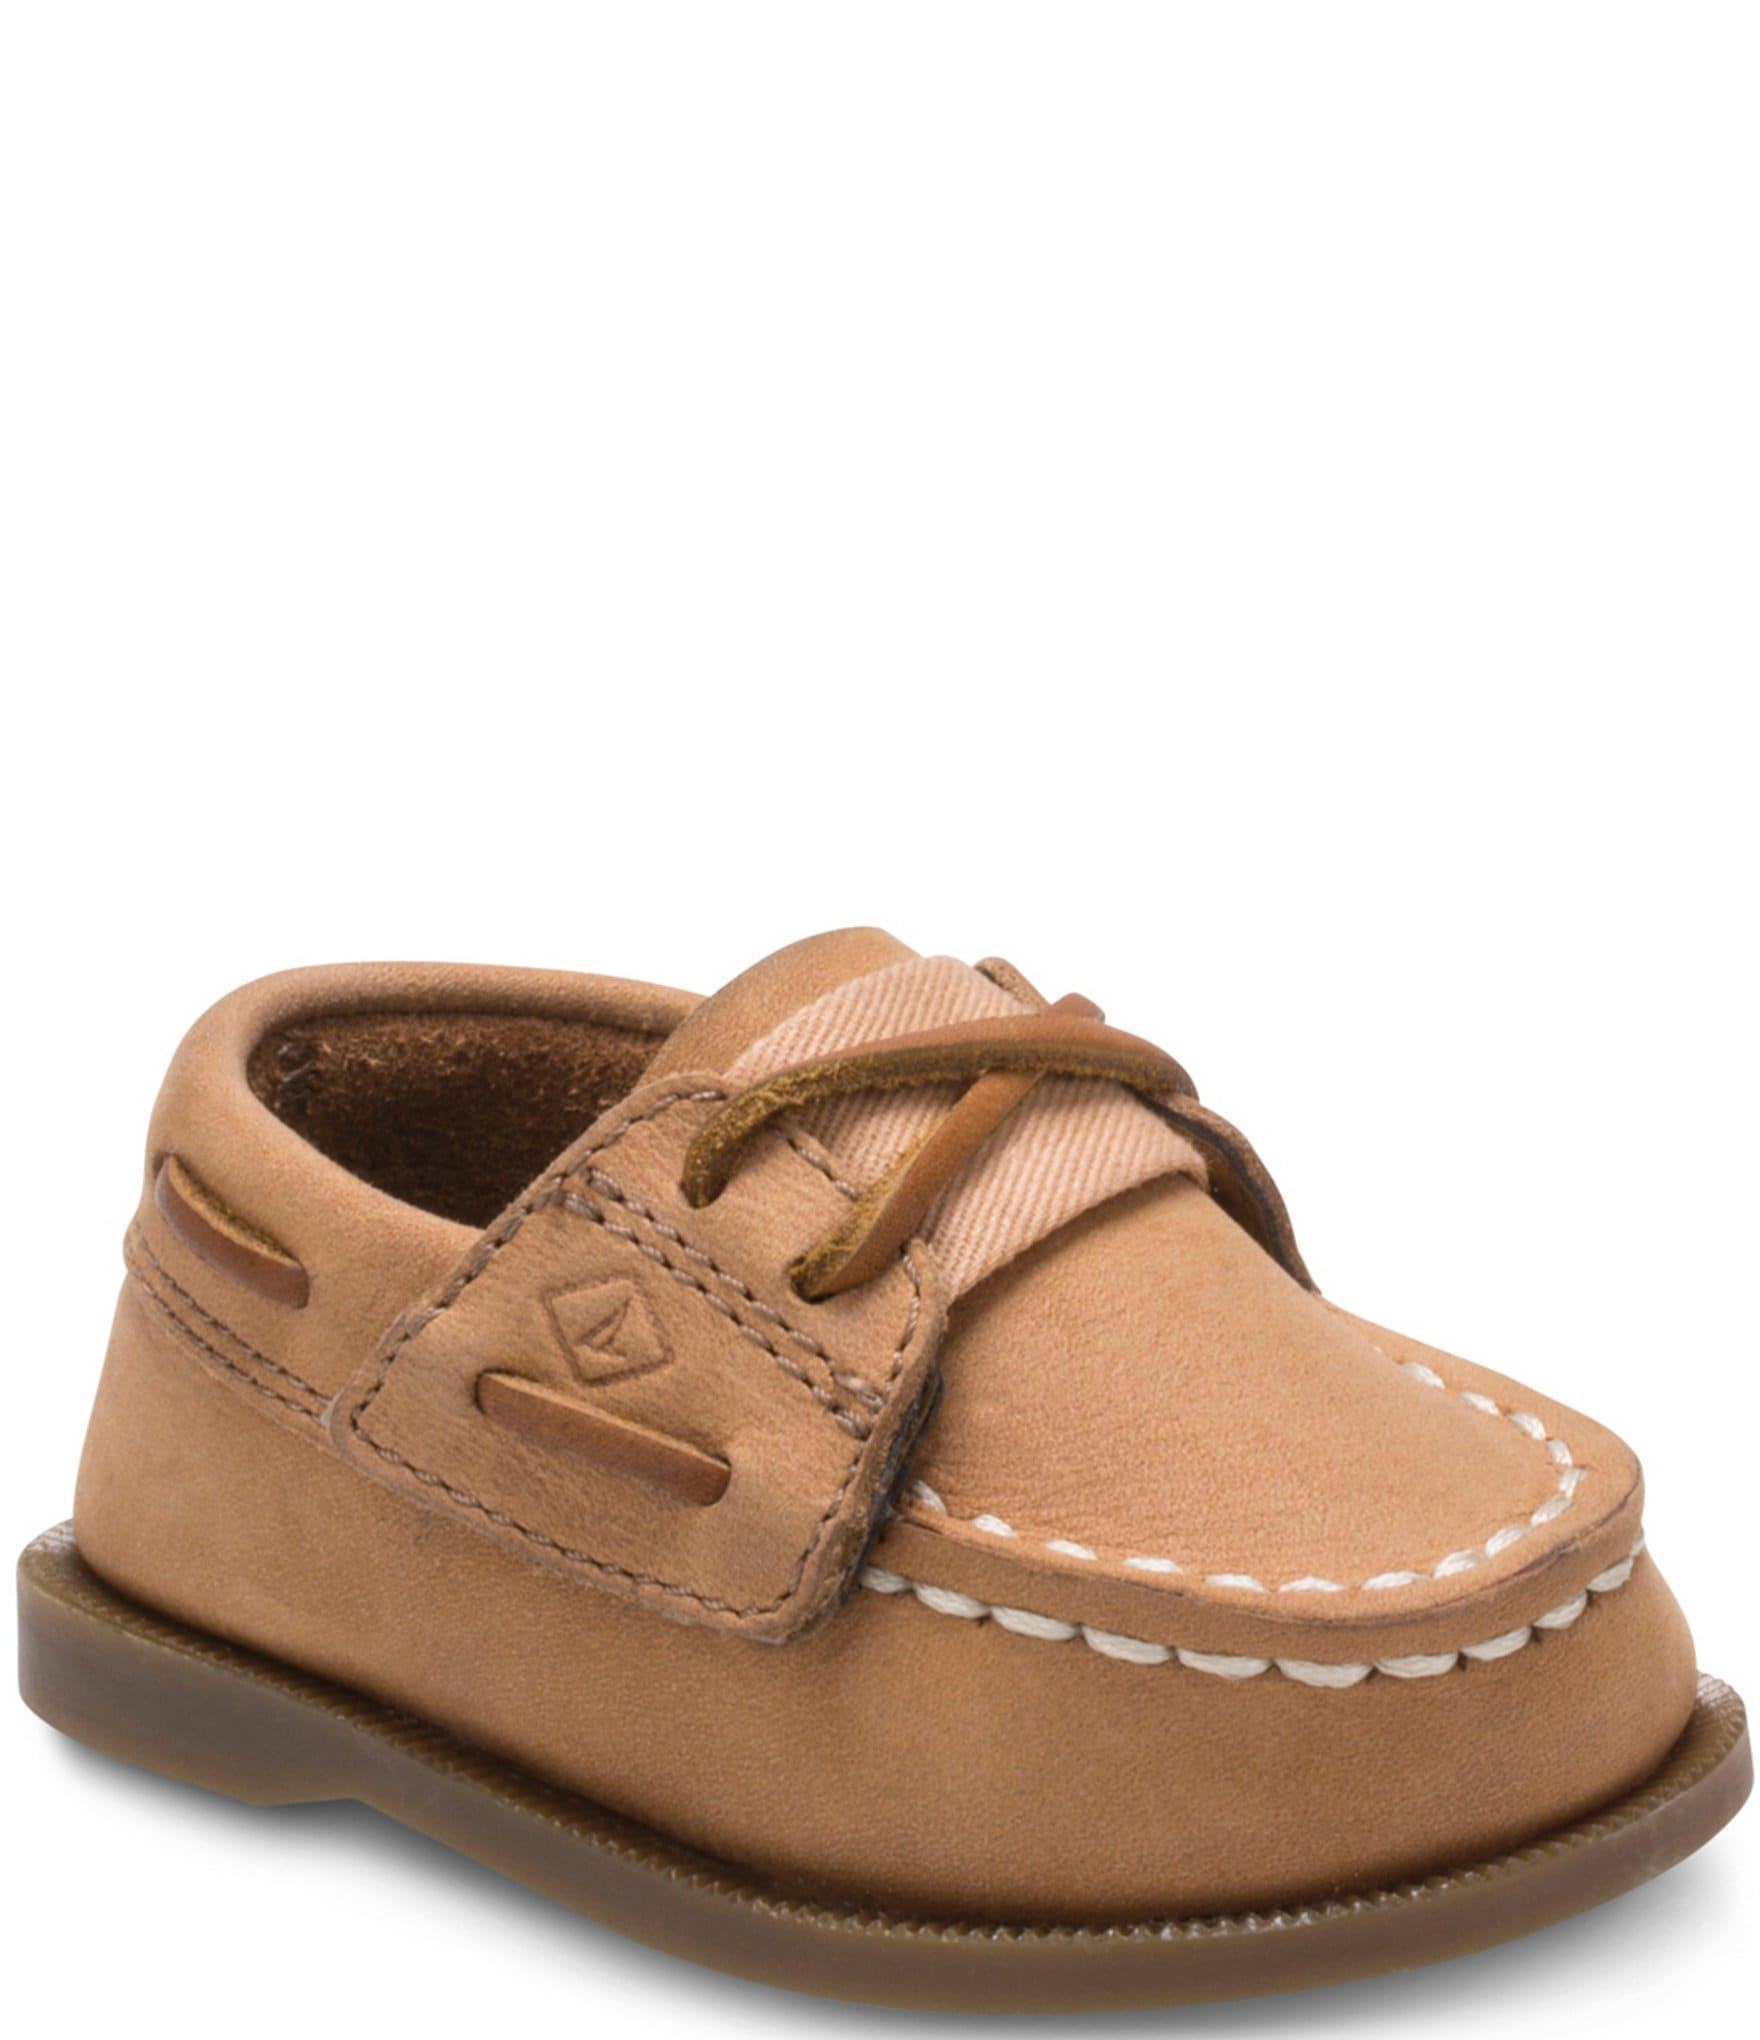 Sperry Baby Boys' Shoes   Dillard's